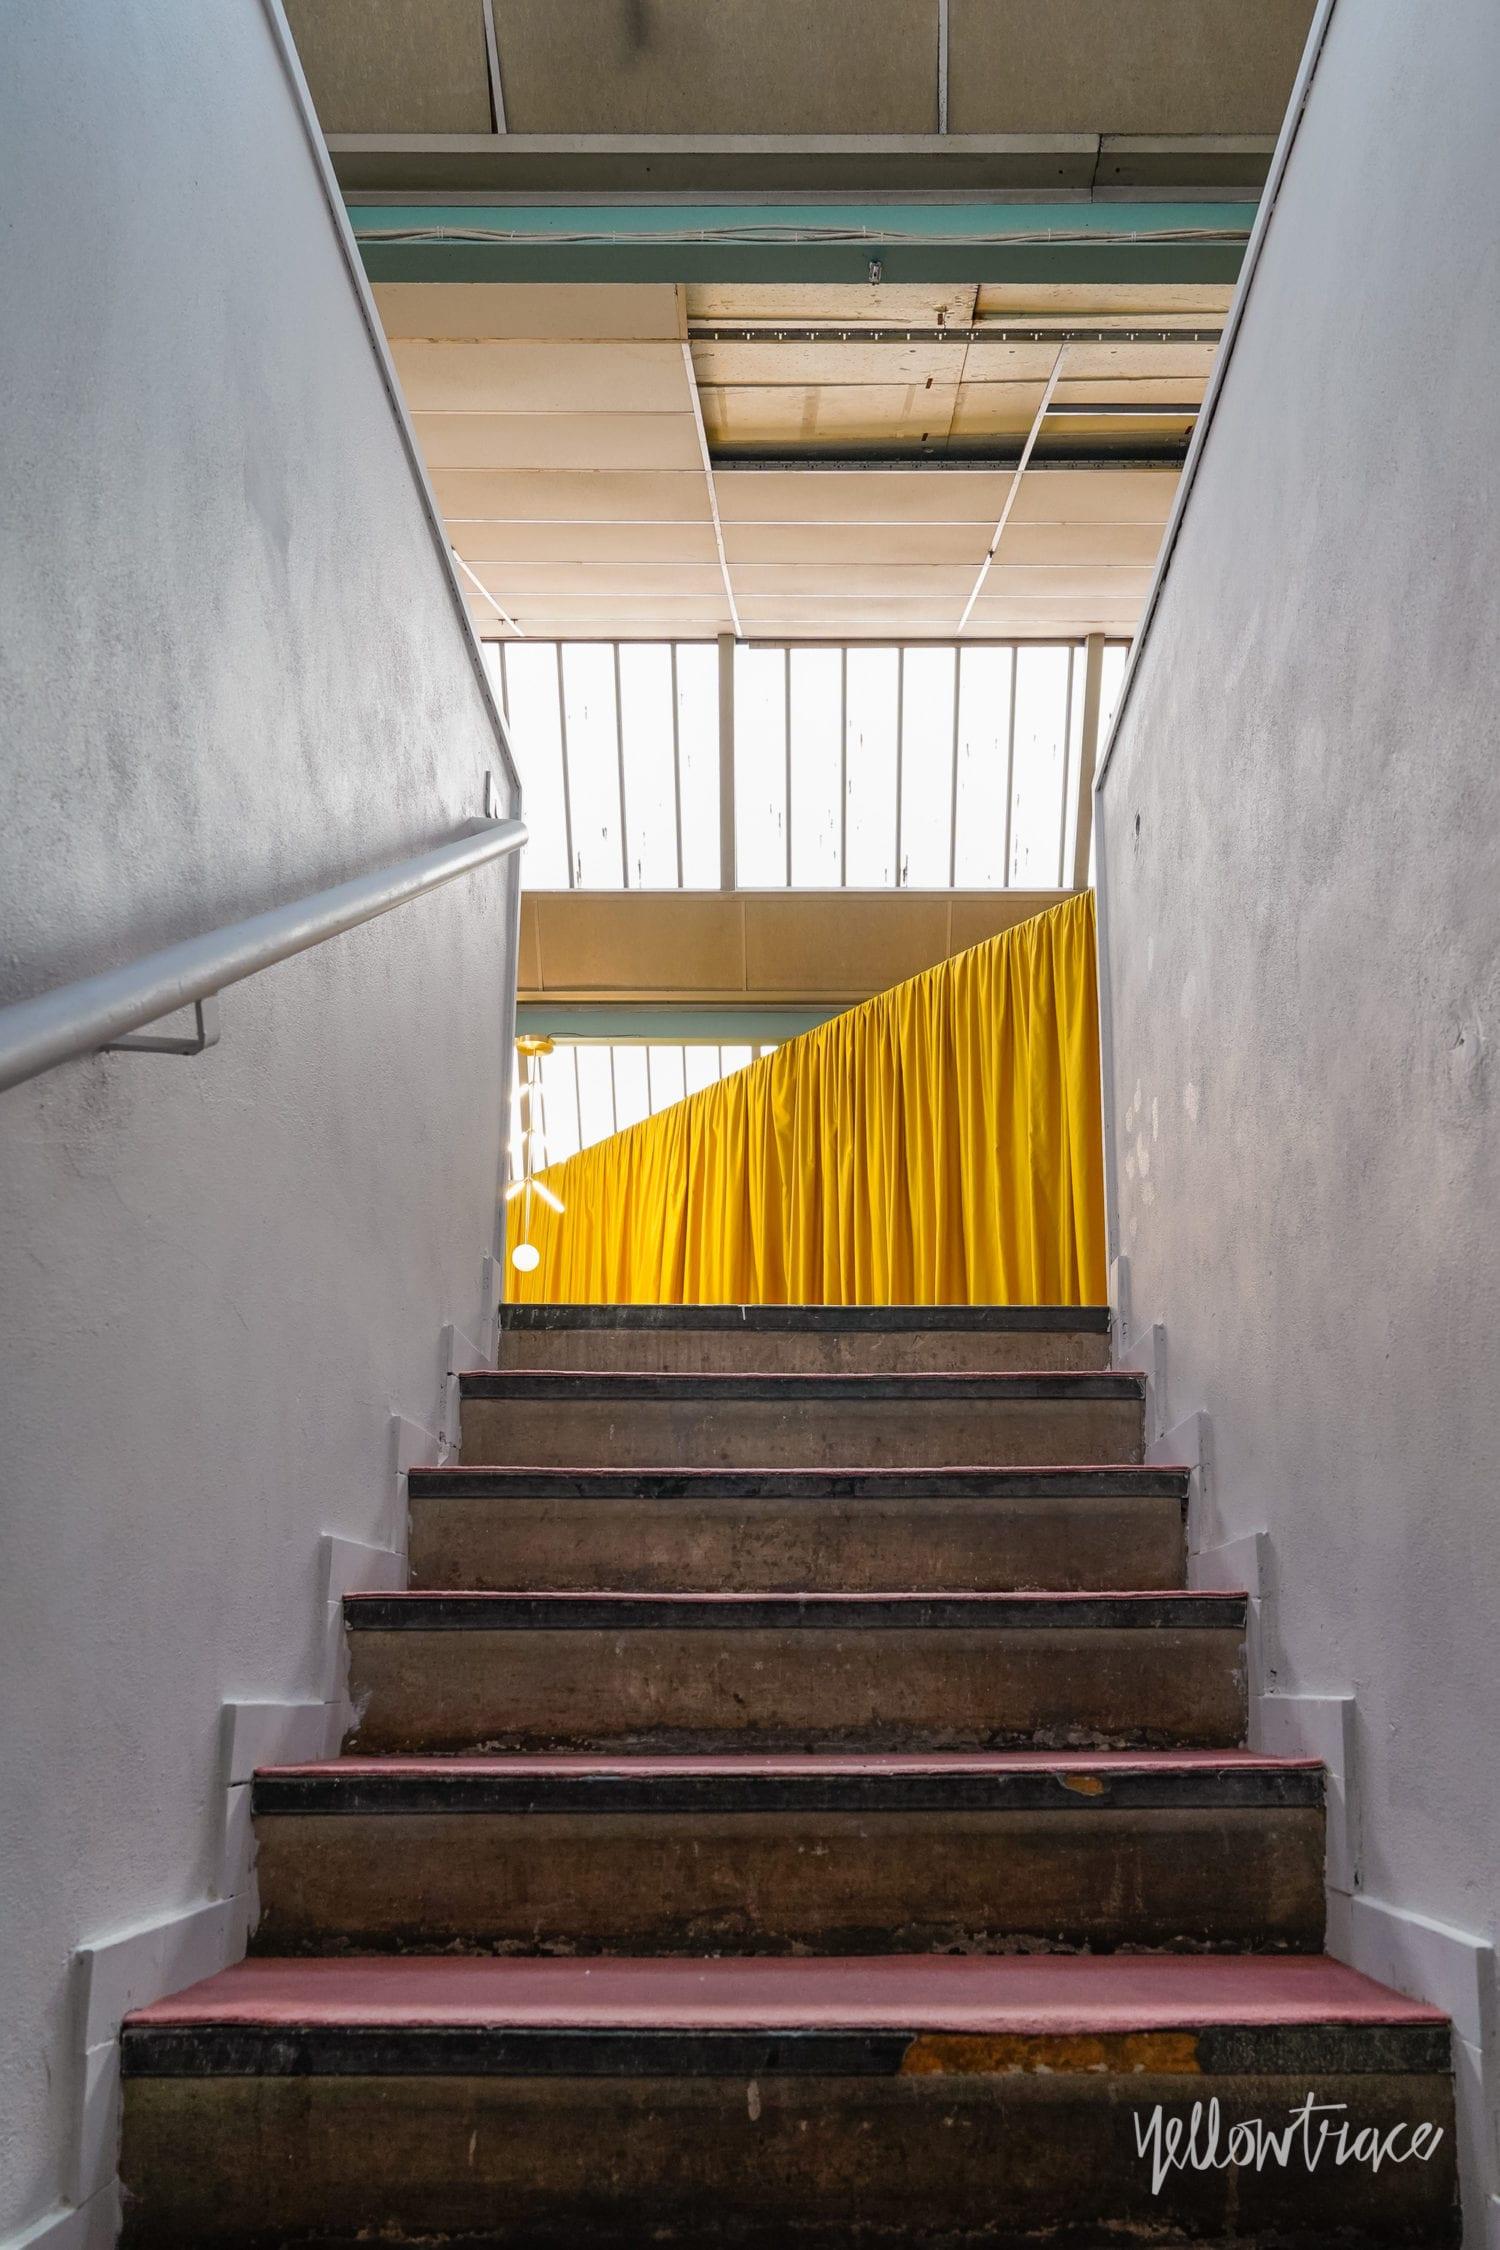 Les Arcanistes Studiopepe At Milan Design Week 2019 Photo Nick Hughes Yellowtrace 41